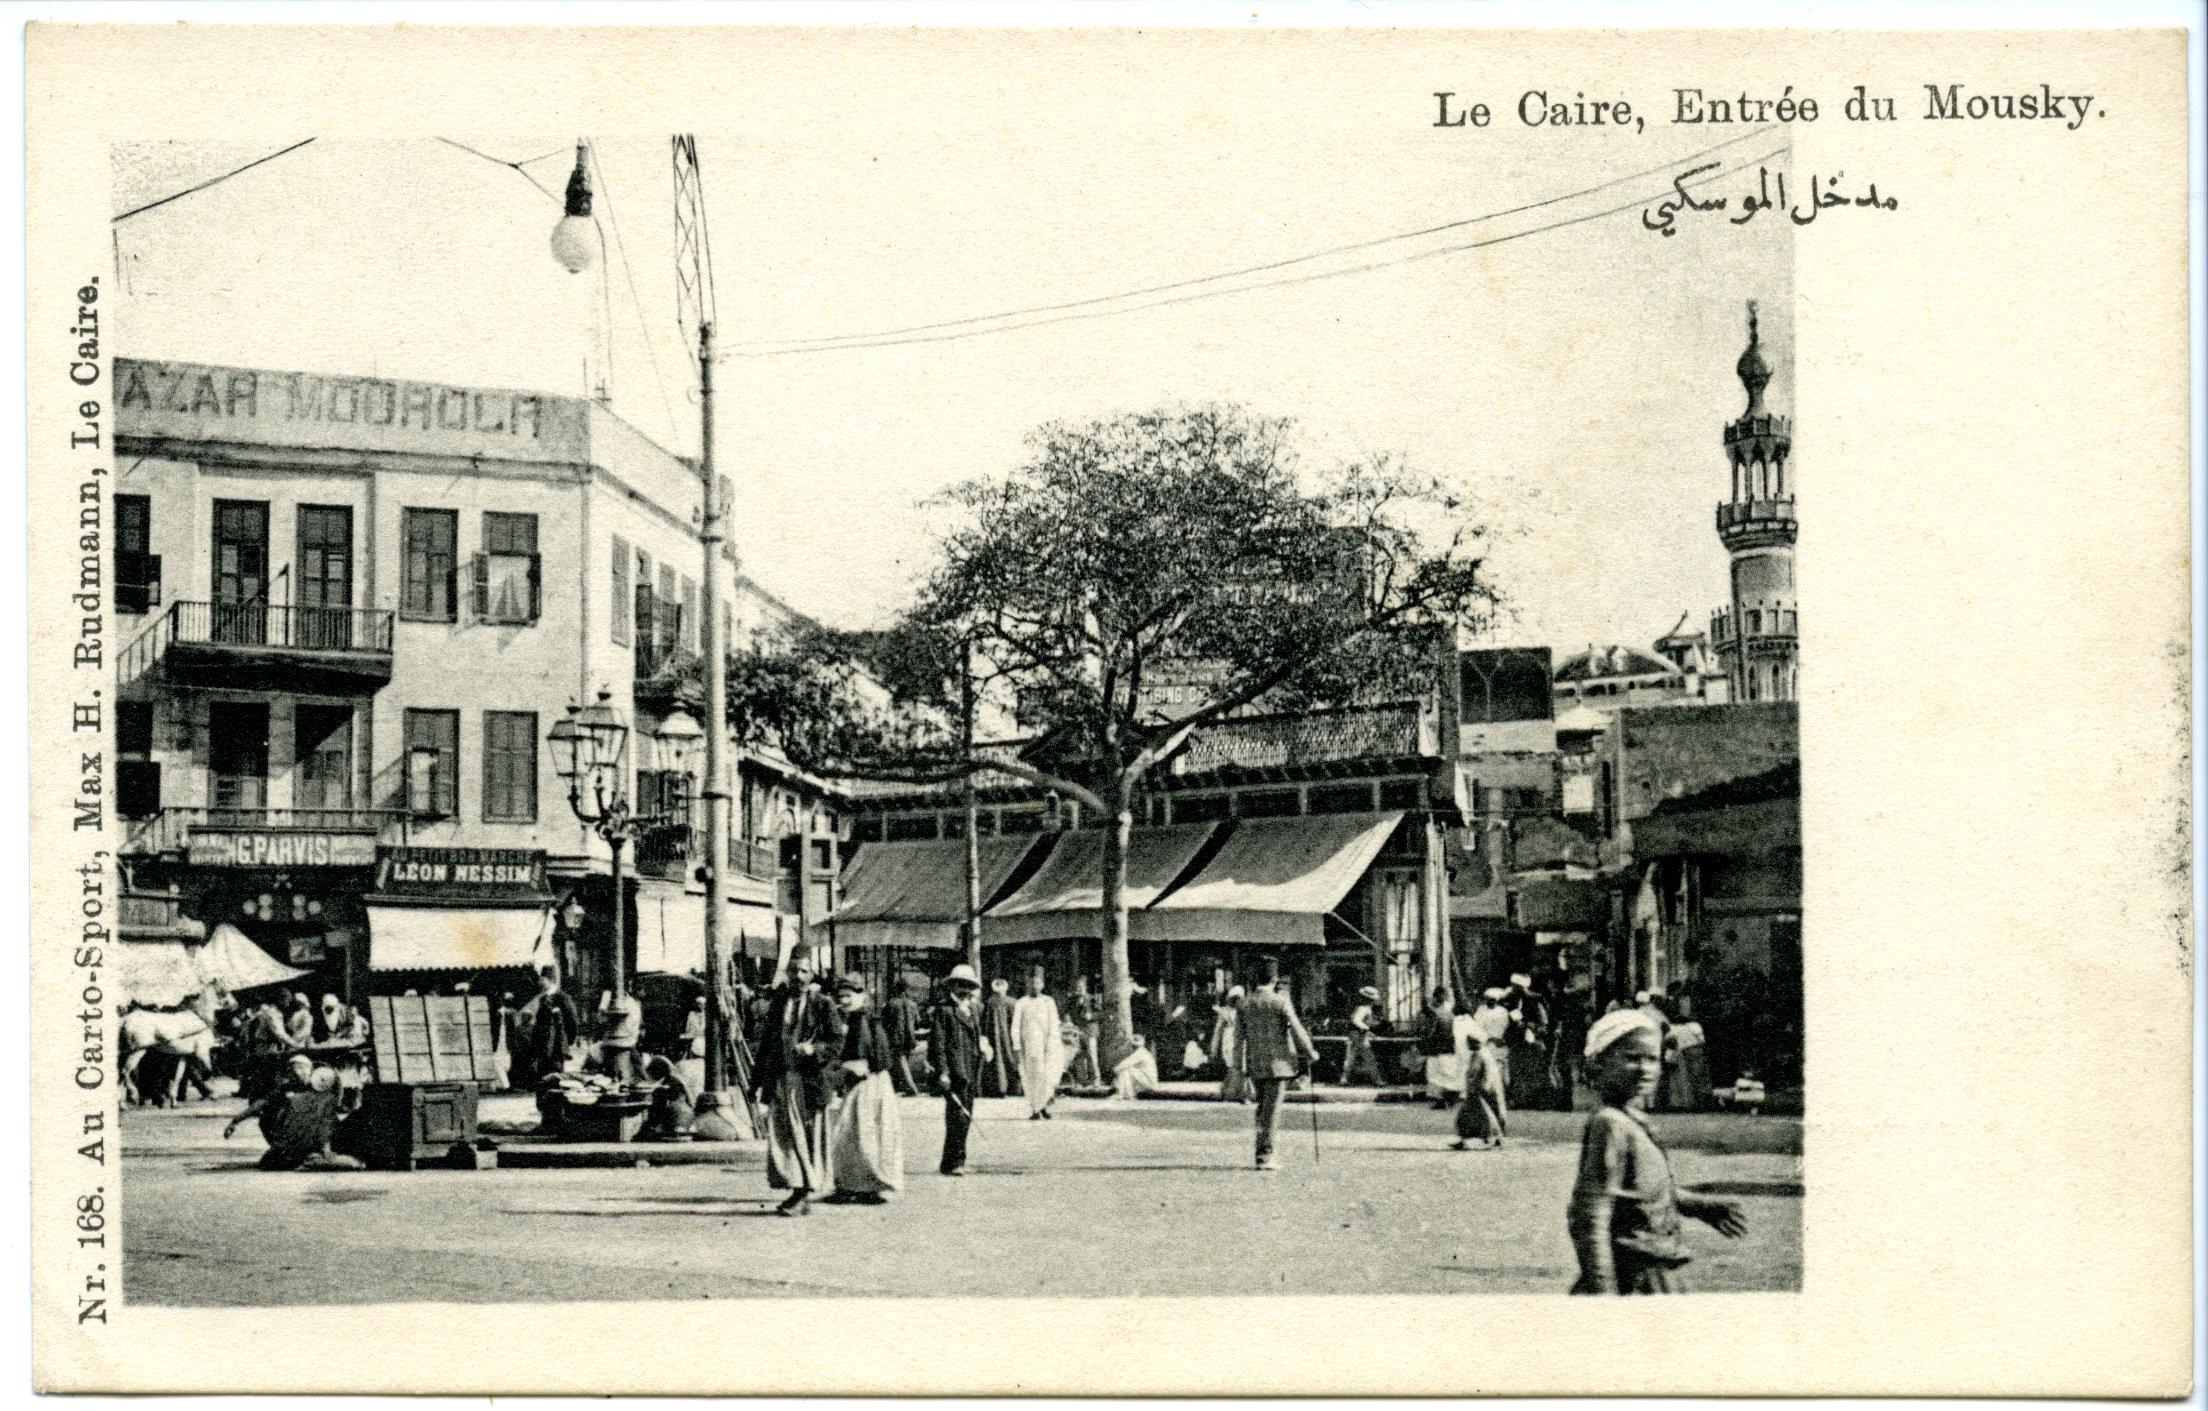 Postcard #11